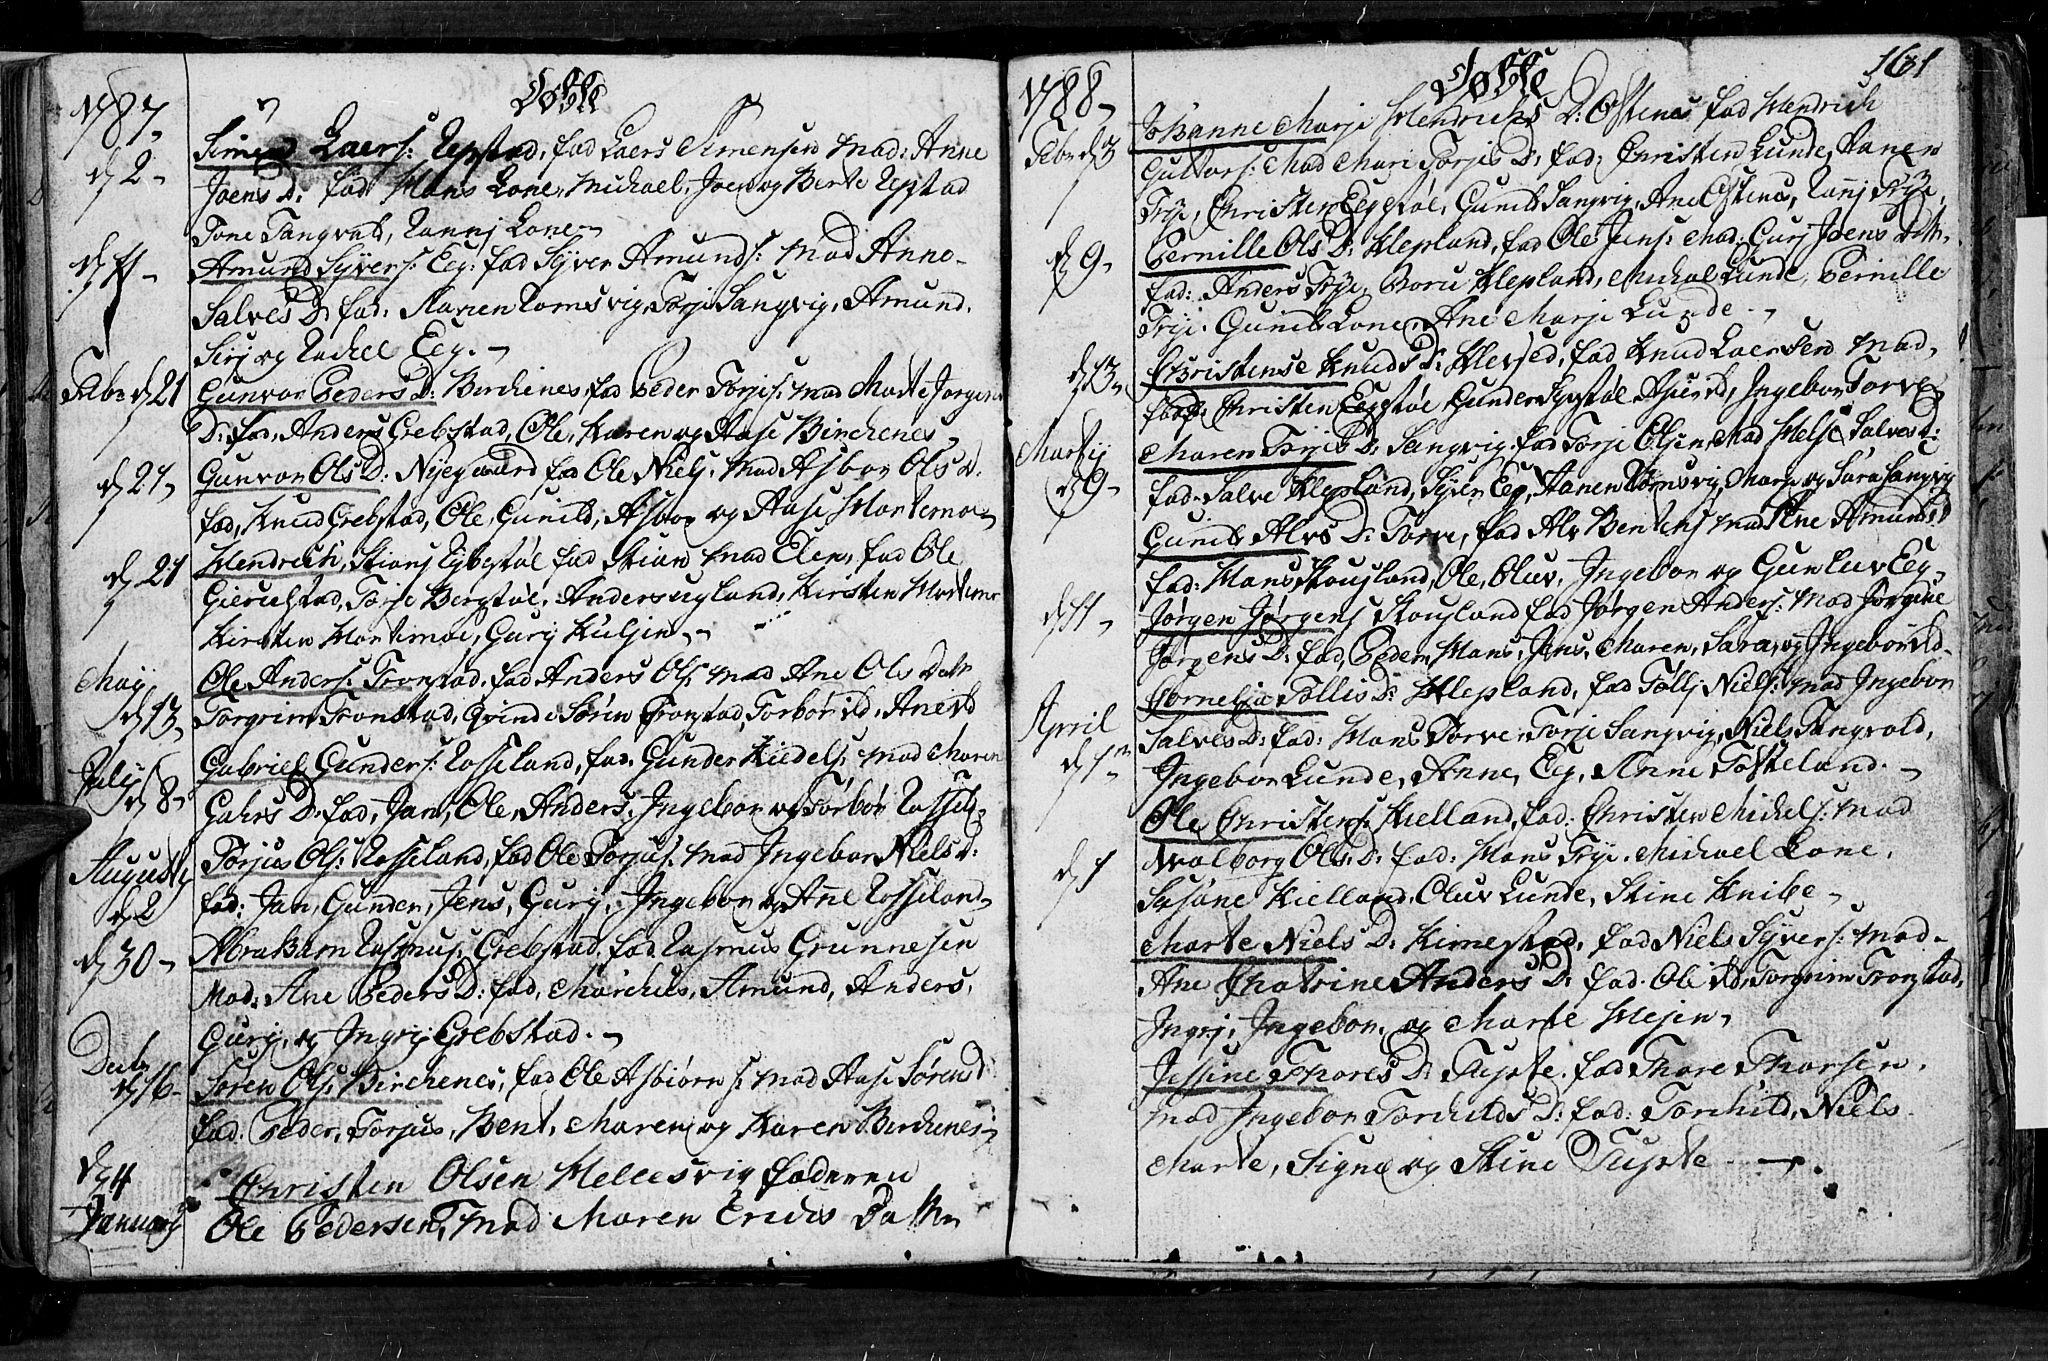 SAK, Søgne sokneprestkontor, F/Fa/Fab/L0004: Ministerialbok nr. A 4, 1770-1822, s. 160-161